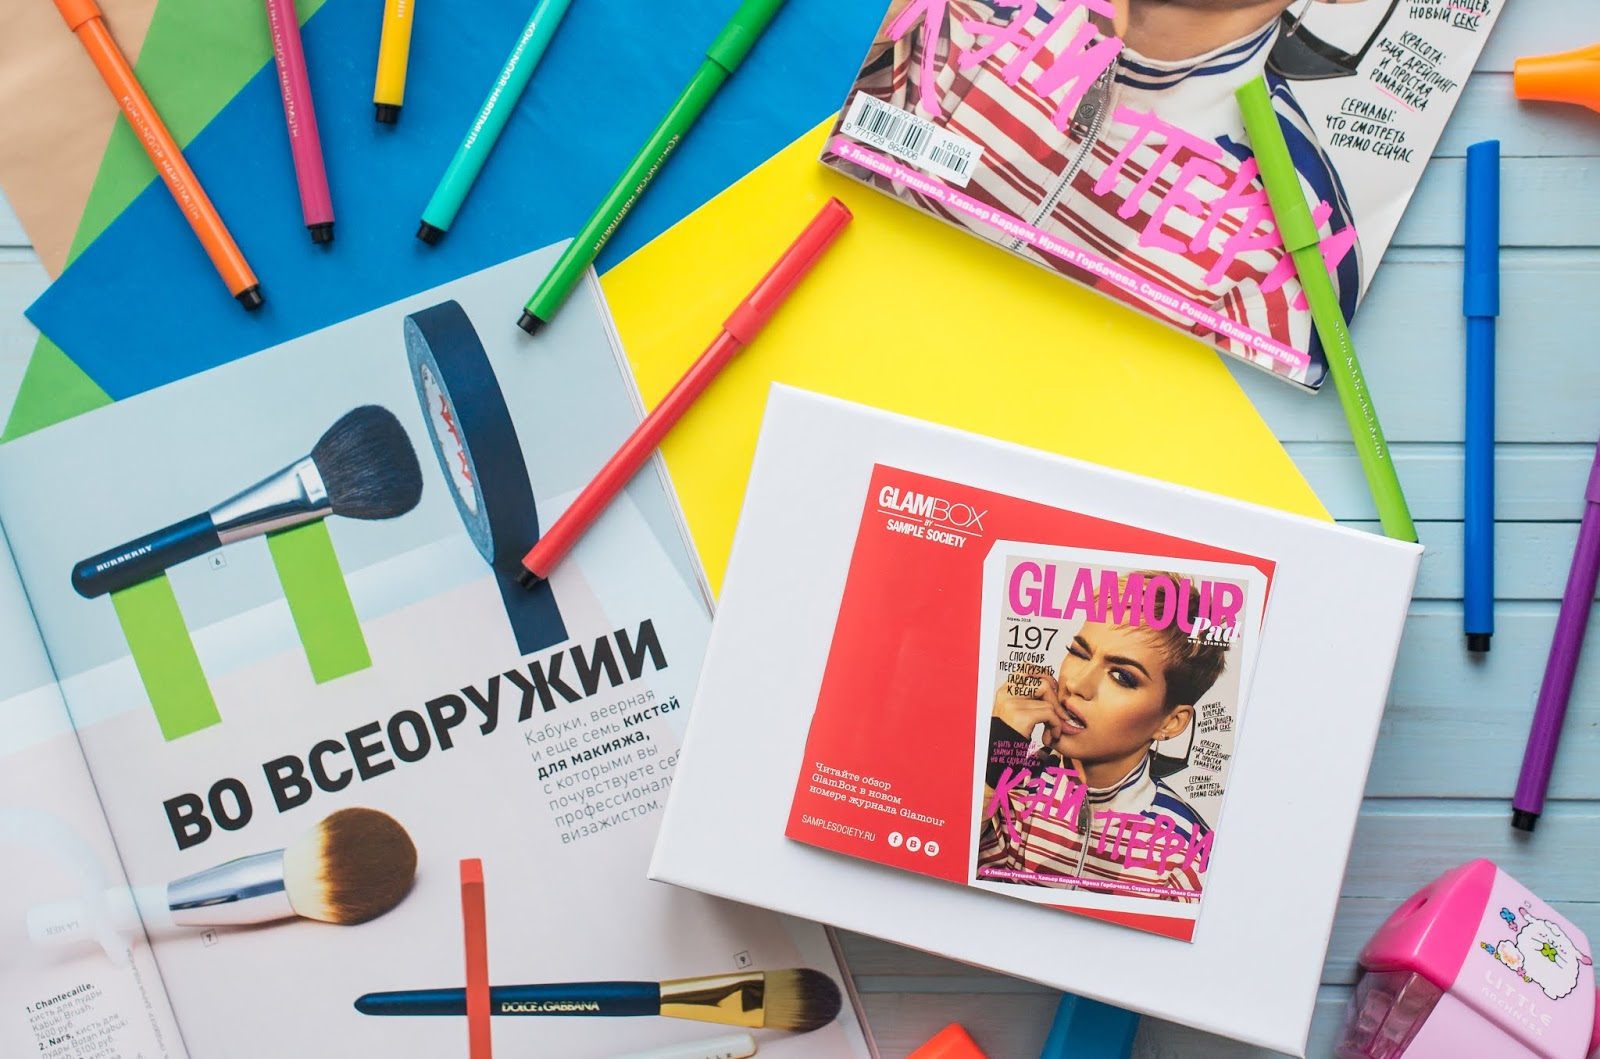 http://www.recklessdiary.ru/2018/06/glambag-glambox-3-Garnier-siyanie-sakury-Vichy-Mineral-89-Ducray-Keracnyl-Serum-Purple-Tree-Miracle-Balm.html